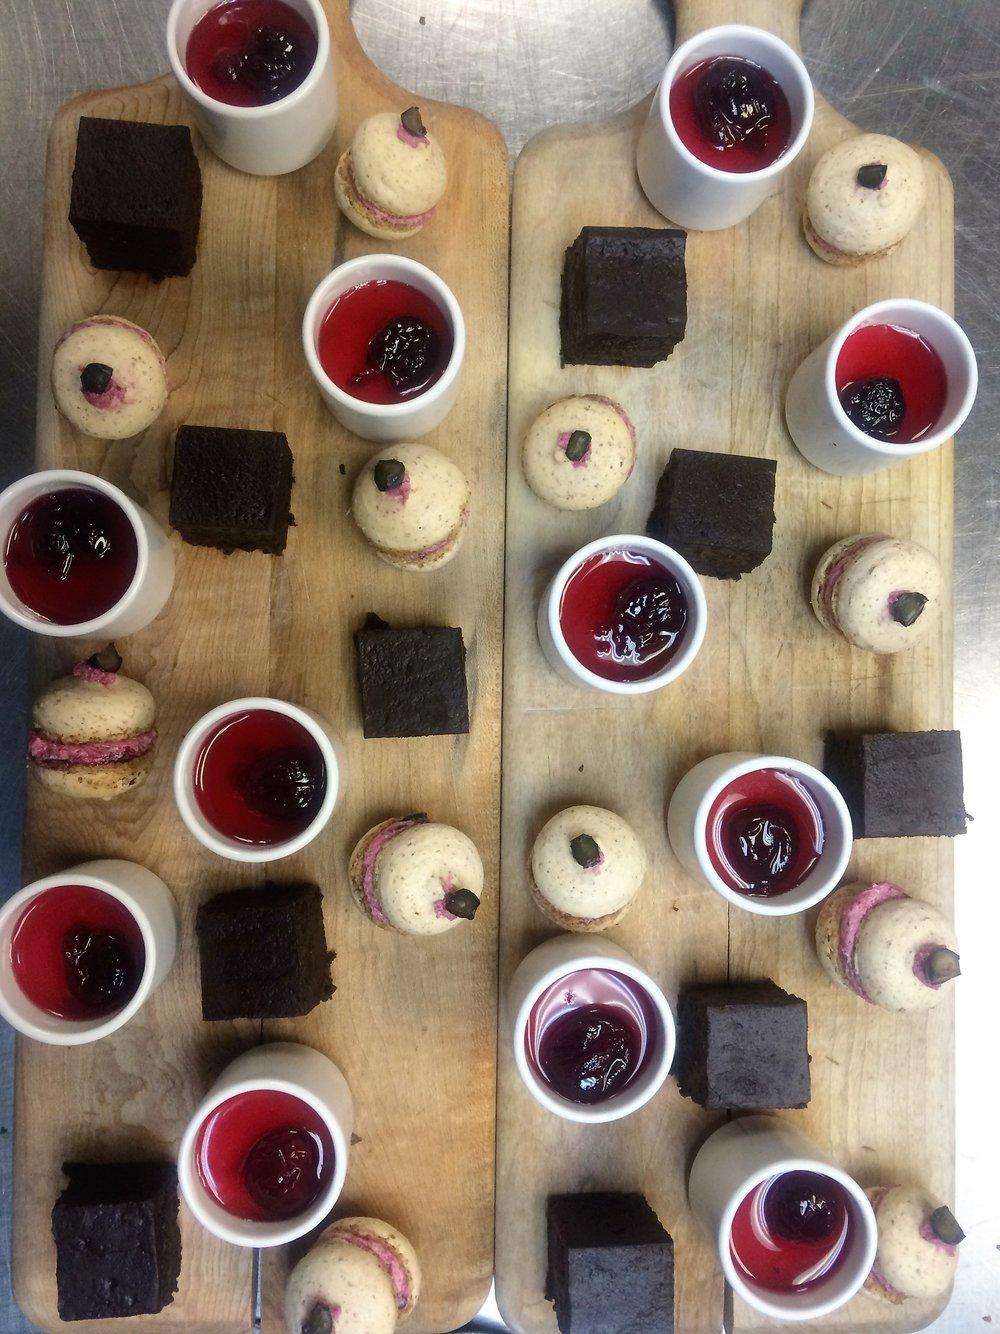 Chocolate Flourless Cake - Sour Cherry Panacotta - Berry Almond Macarons